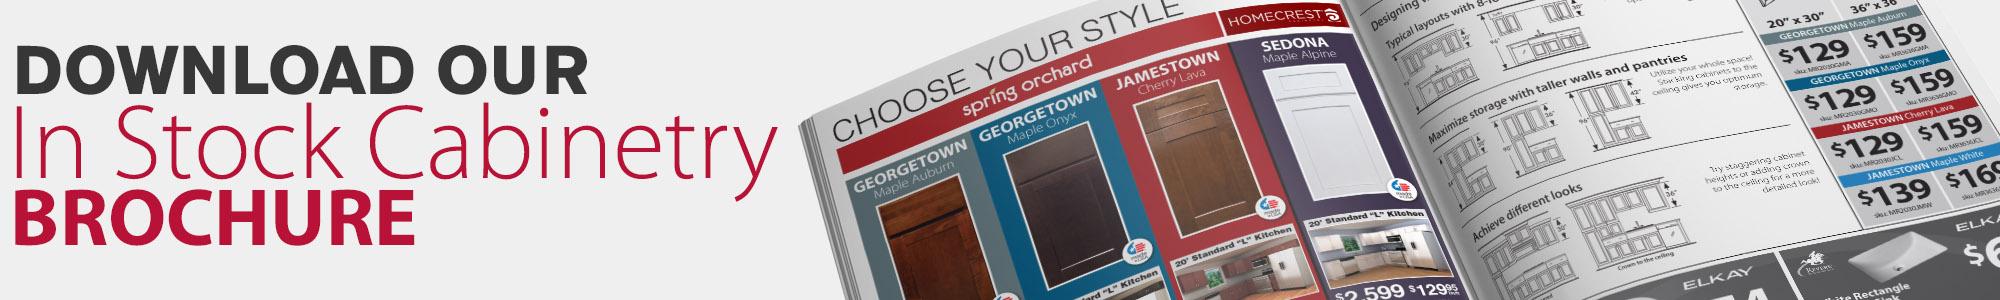 instock cabinet brochure button